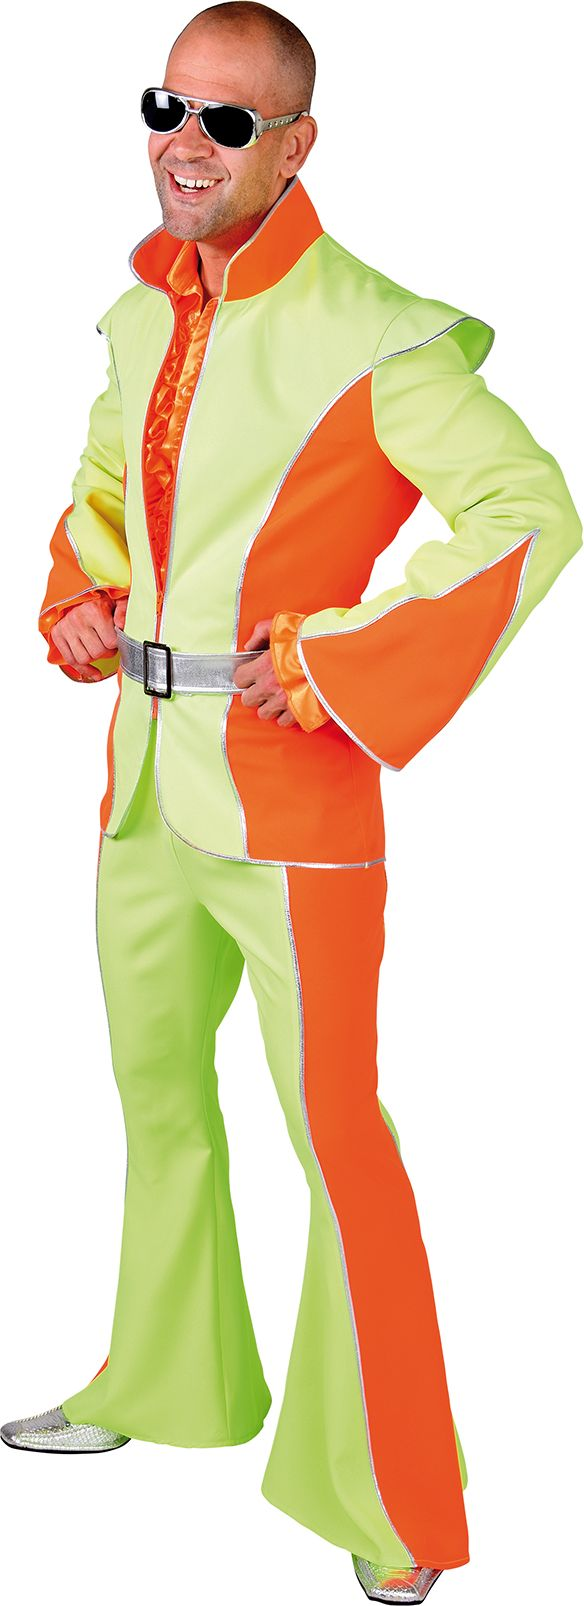 Fluor oranje groene disco outfit man